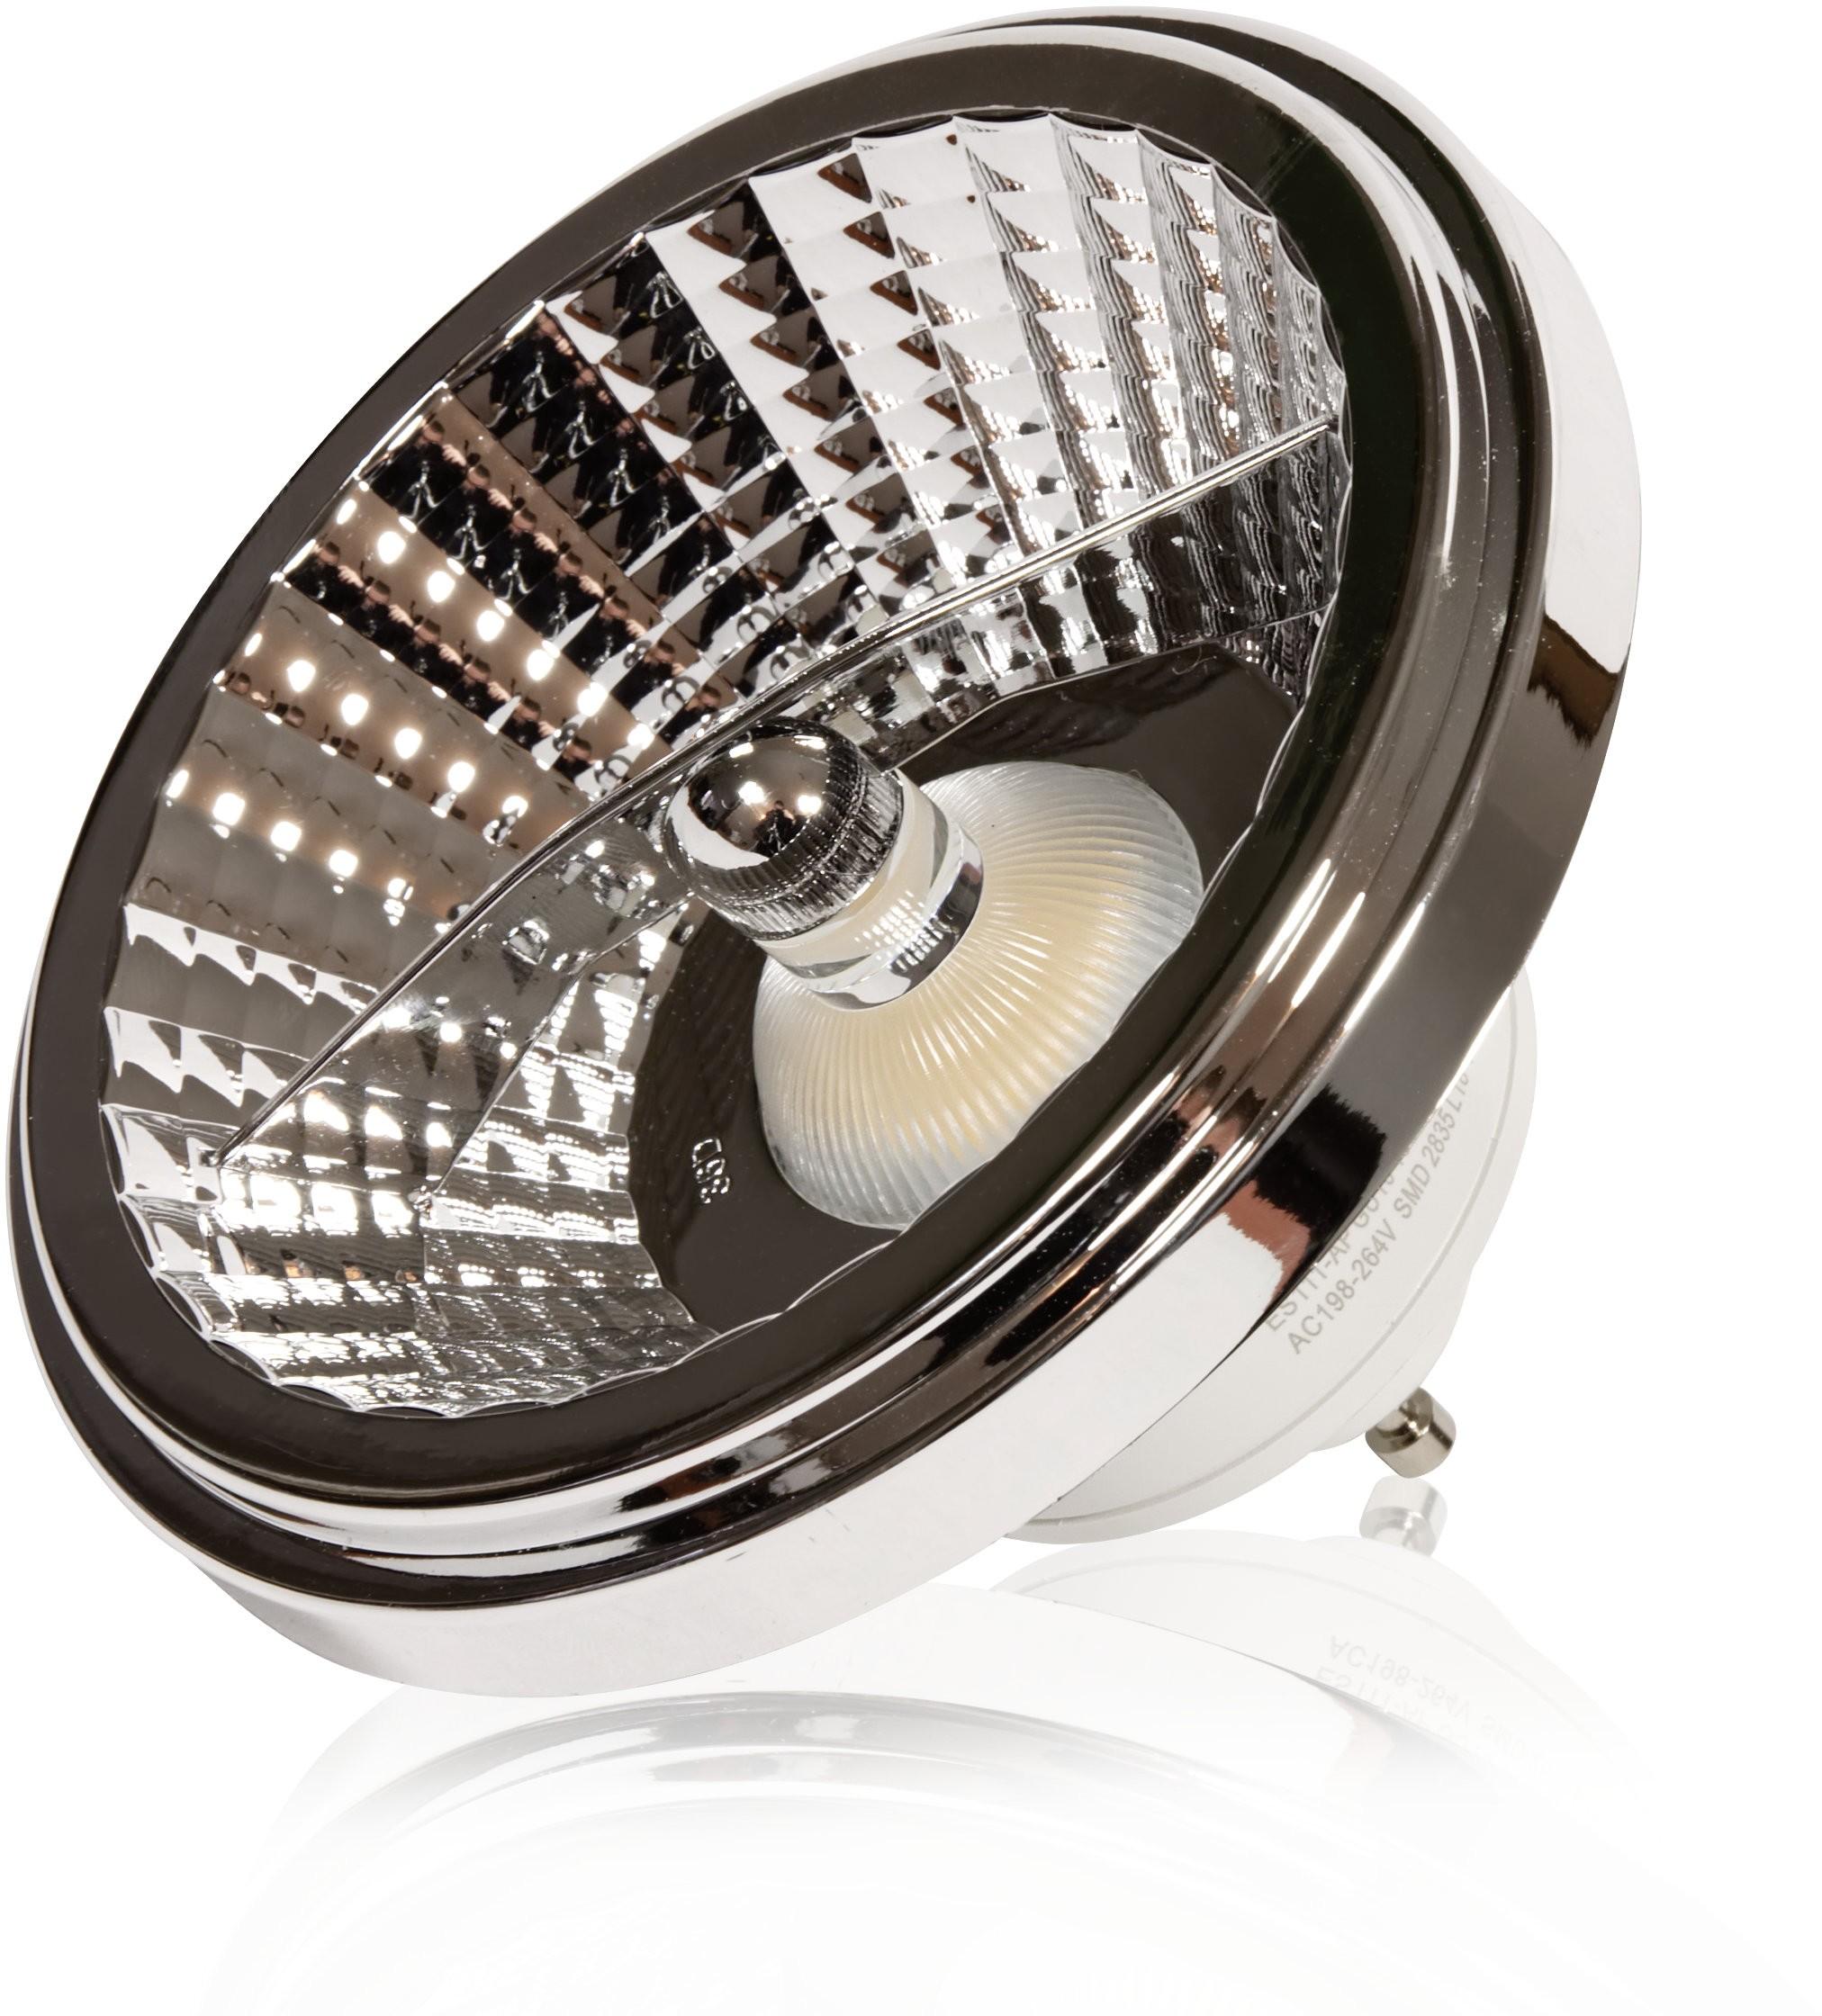 LEDlumen ES111-AP GU10 230V 15W LED 35 st. CCD WW